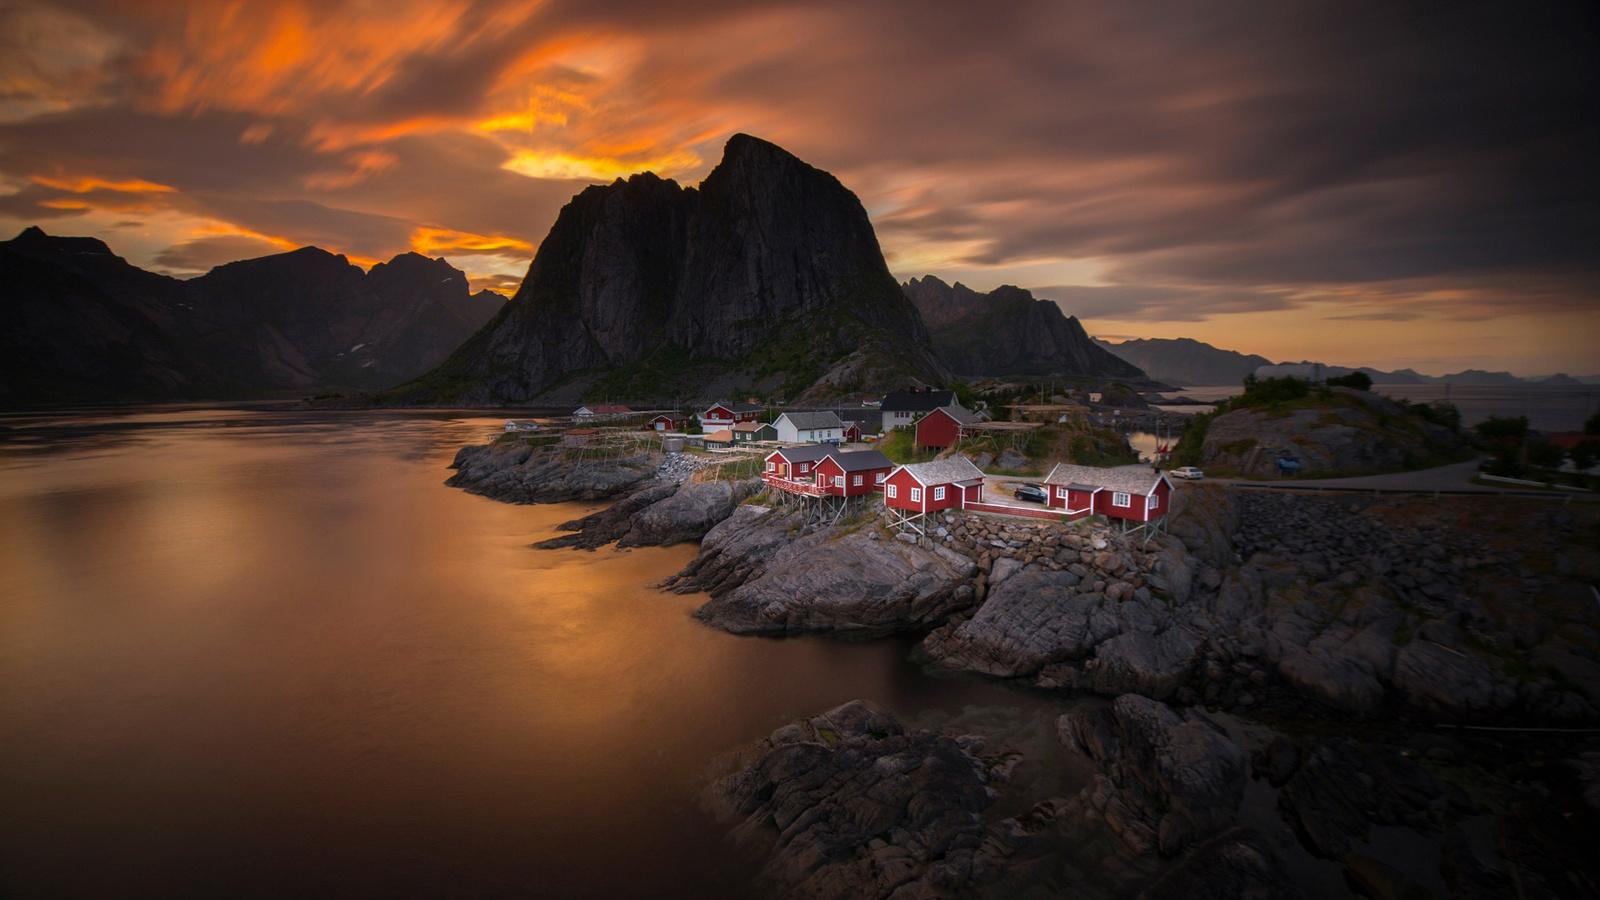 норвегия, небо, облака, закат, вечер, море, горы, поселок, дома